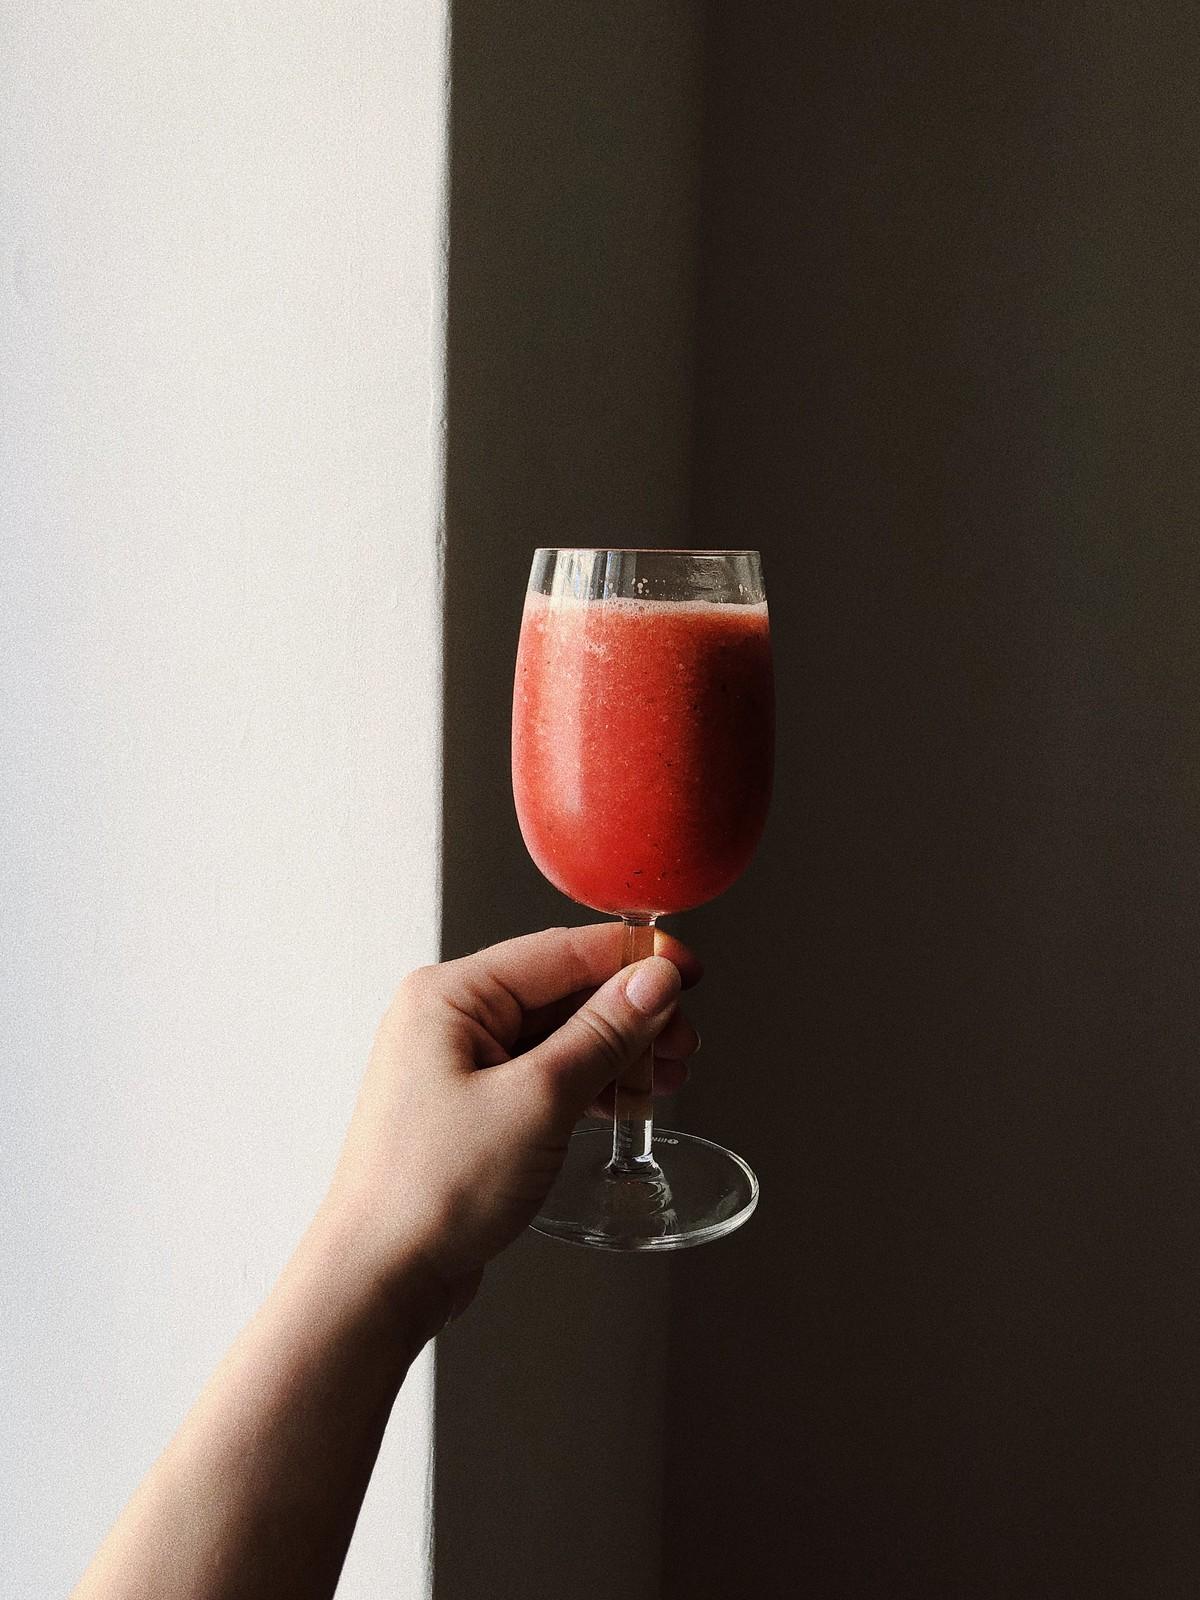 Parhaat alkoholittomat juomat